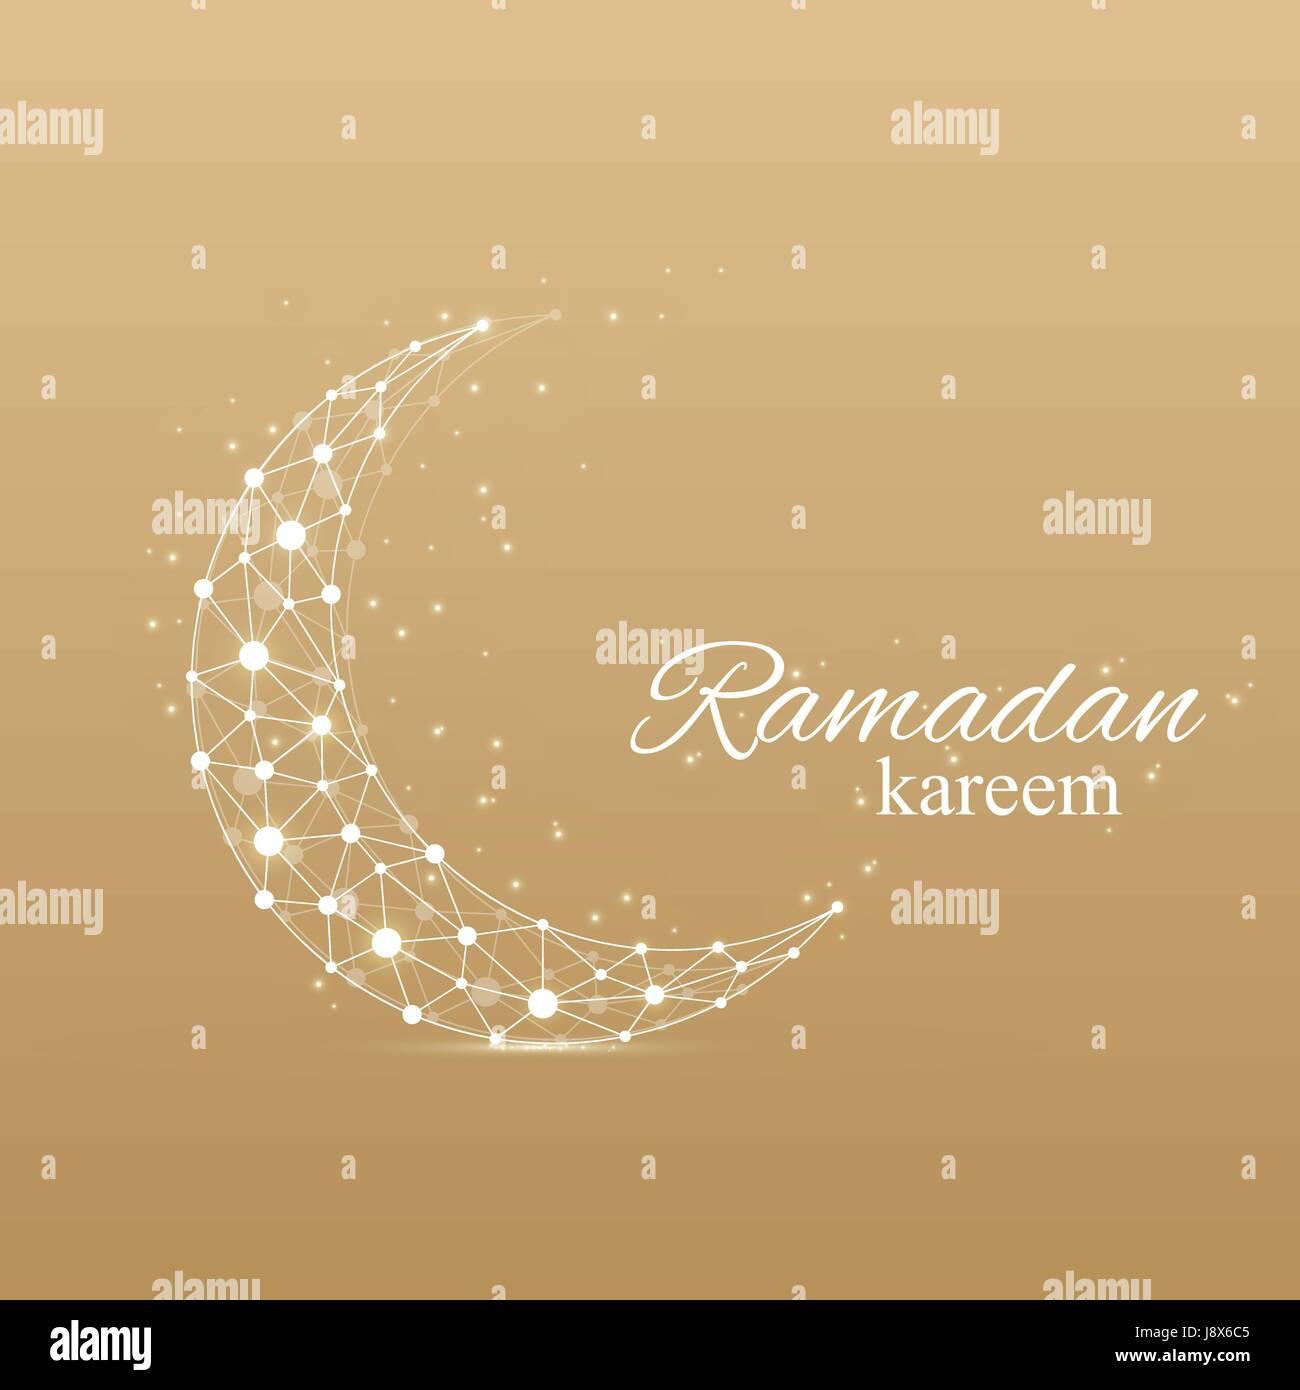 Ramadan Greetings Stock Photos Ramadan Greetings Stock Images Alamy